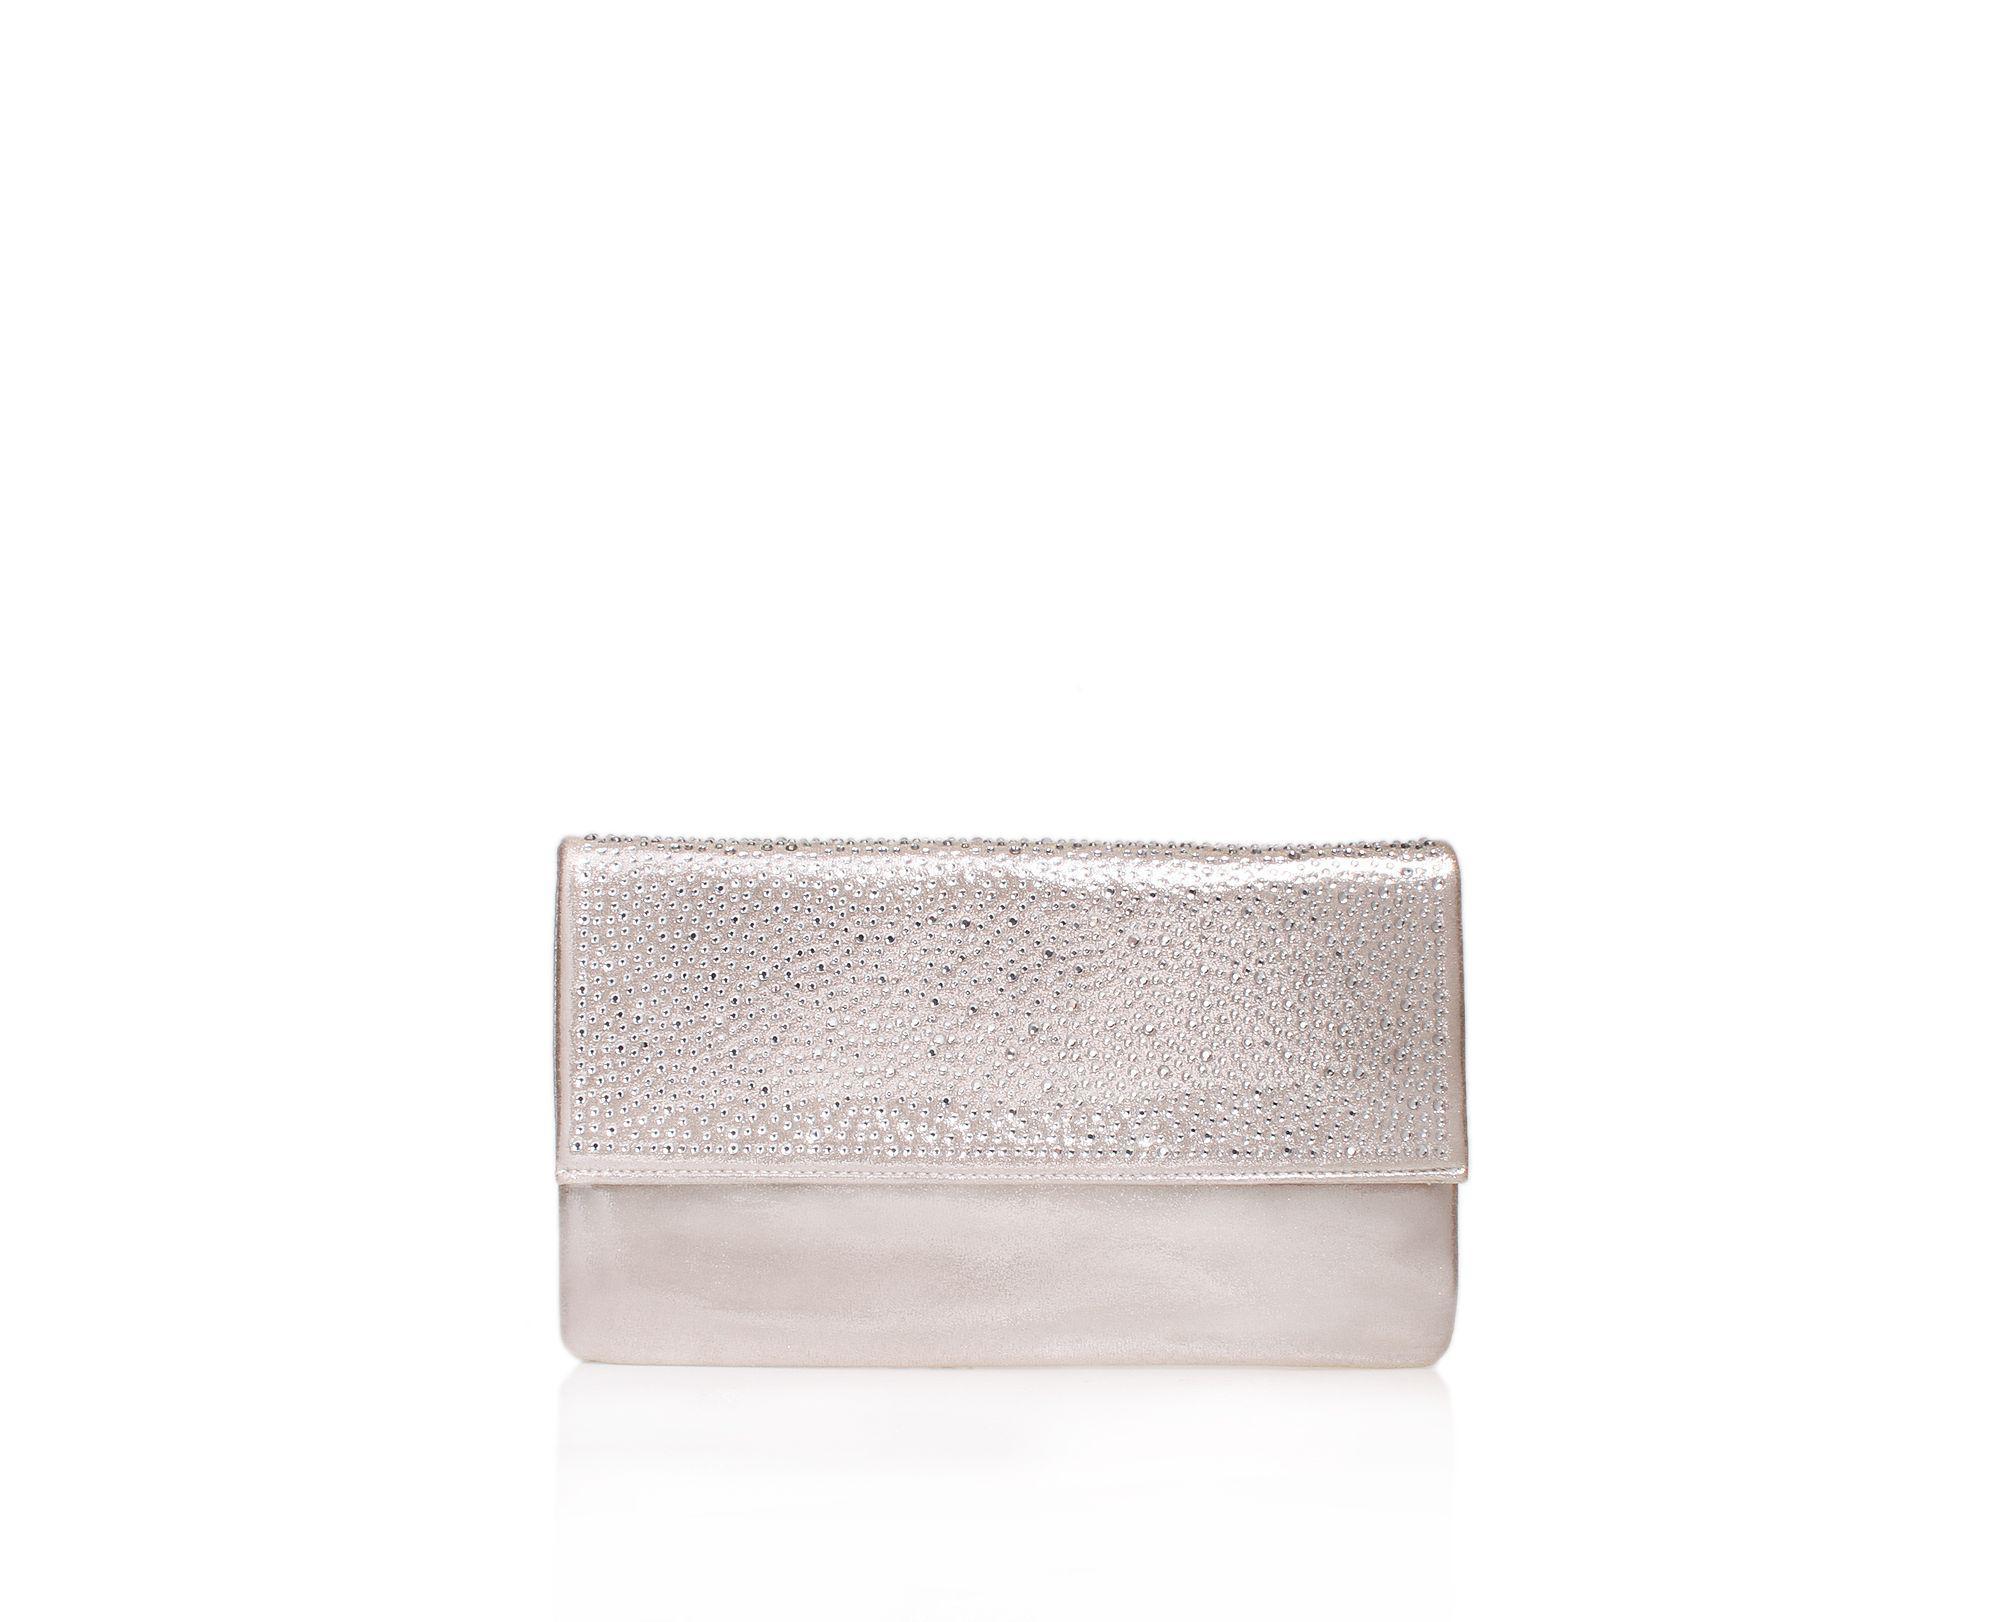 Carvela Kurt Geiger Desire Clutch Bag in Metallic - Save 61% - Lyst 577251df8eb02